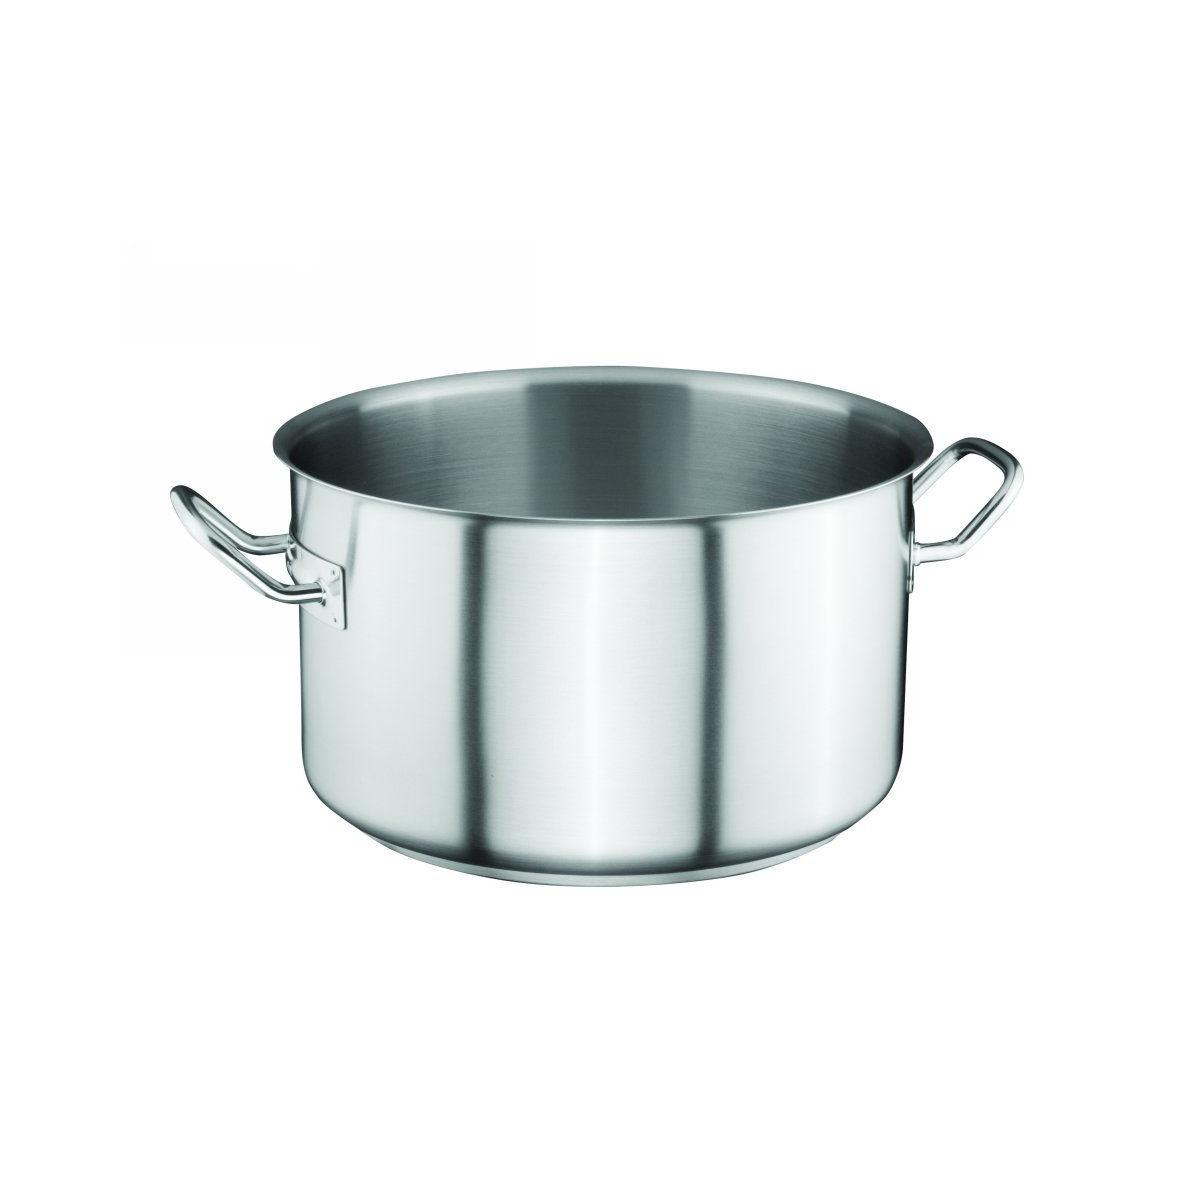 Semioala Gastro Inox 29.5 L / 40*25 Cm 2021 aranjareamesei.ro